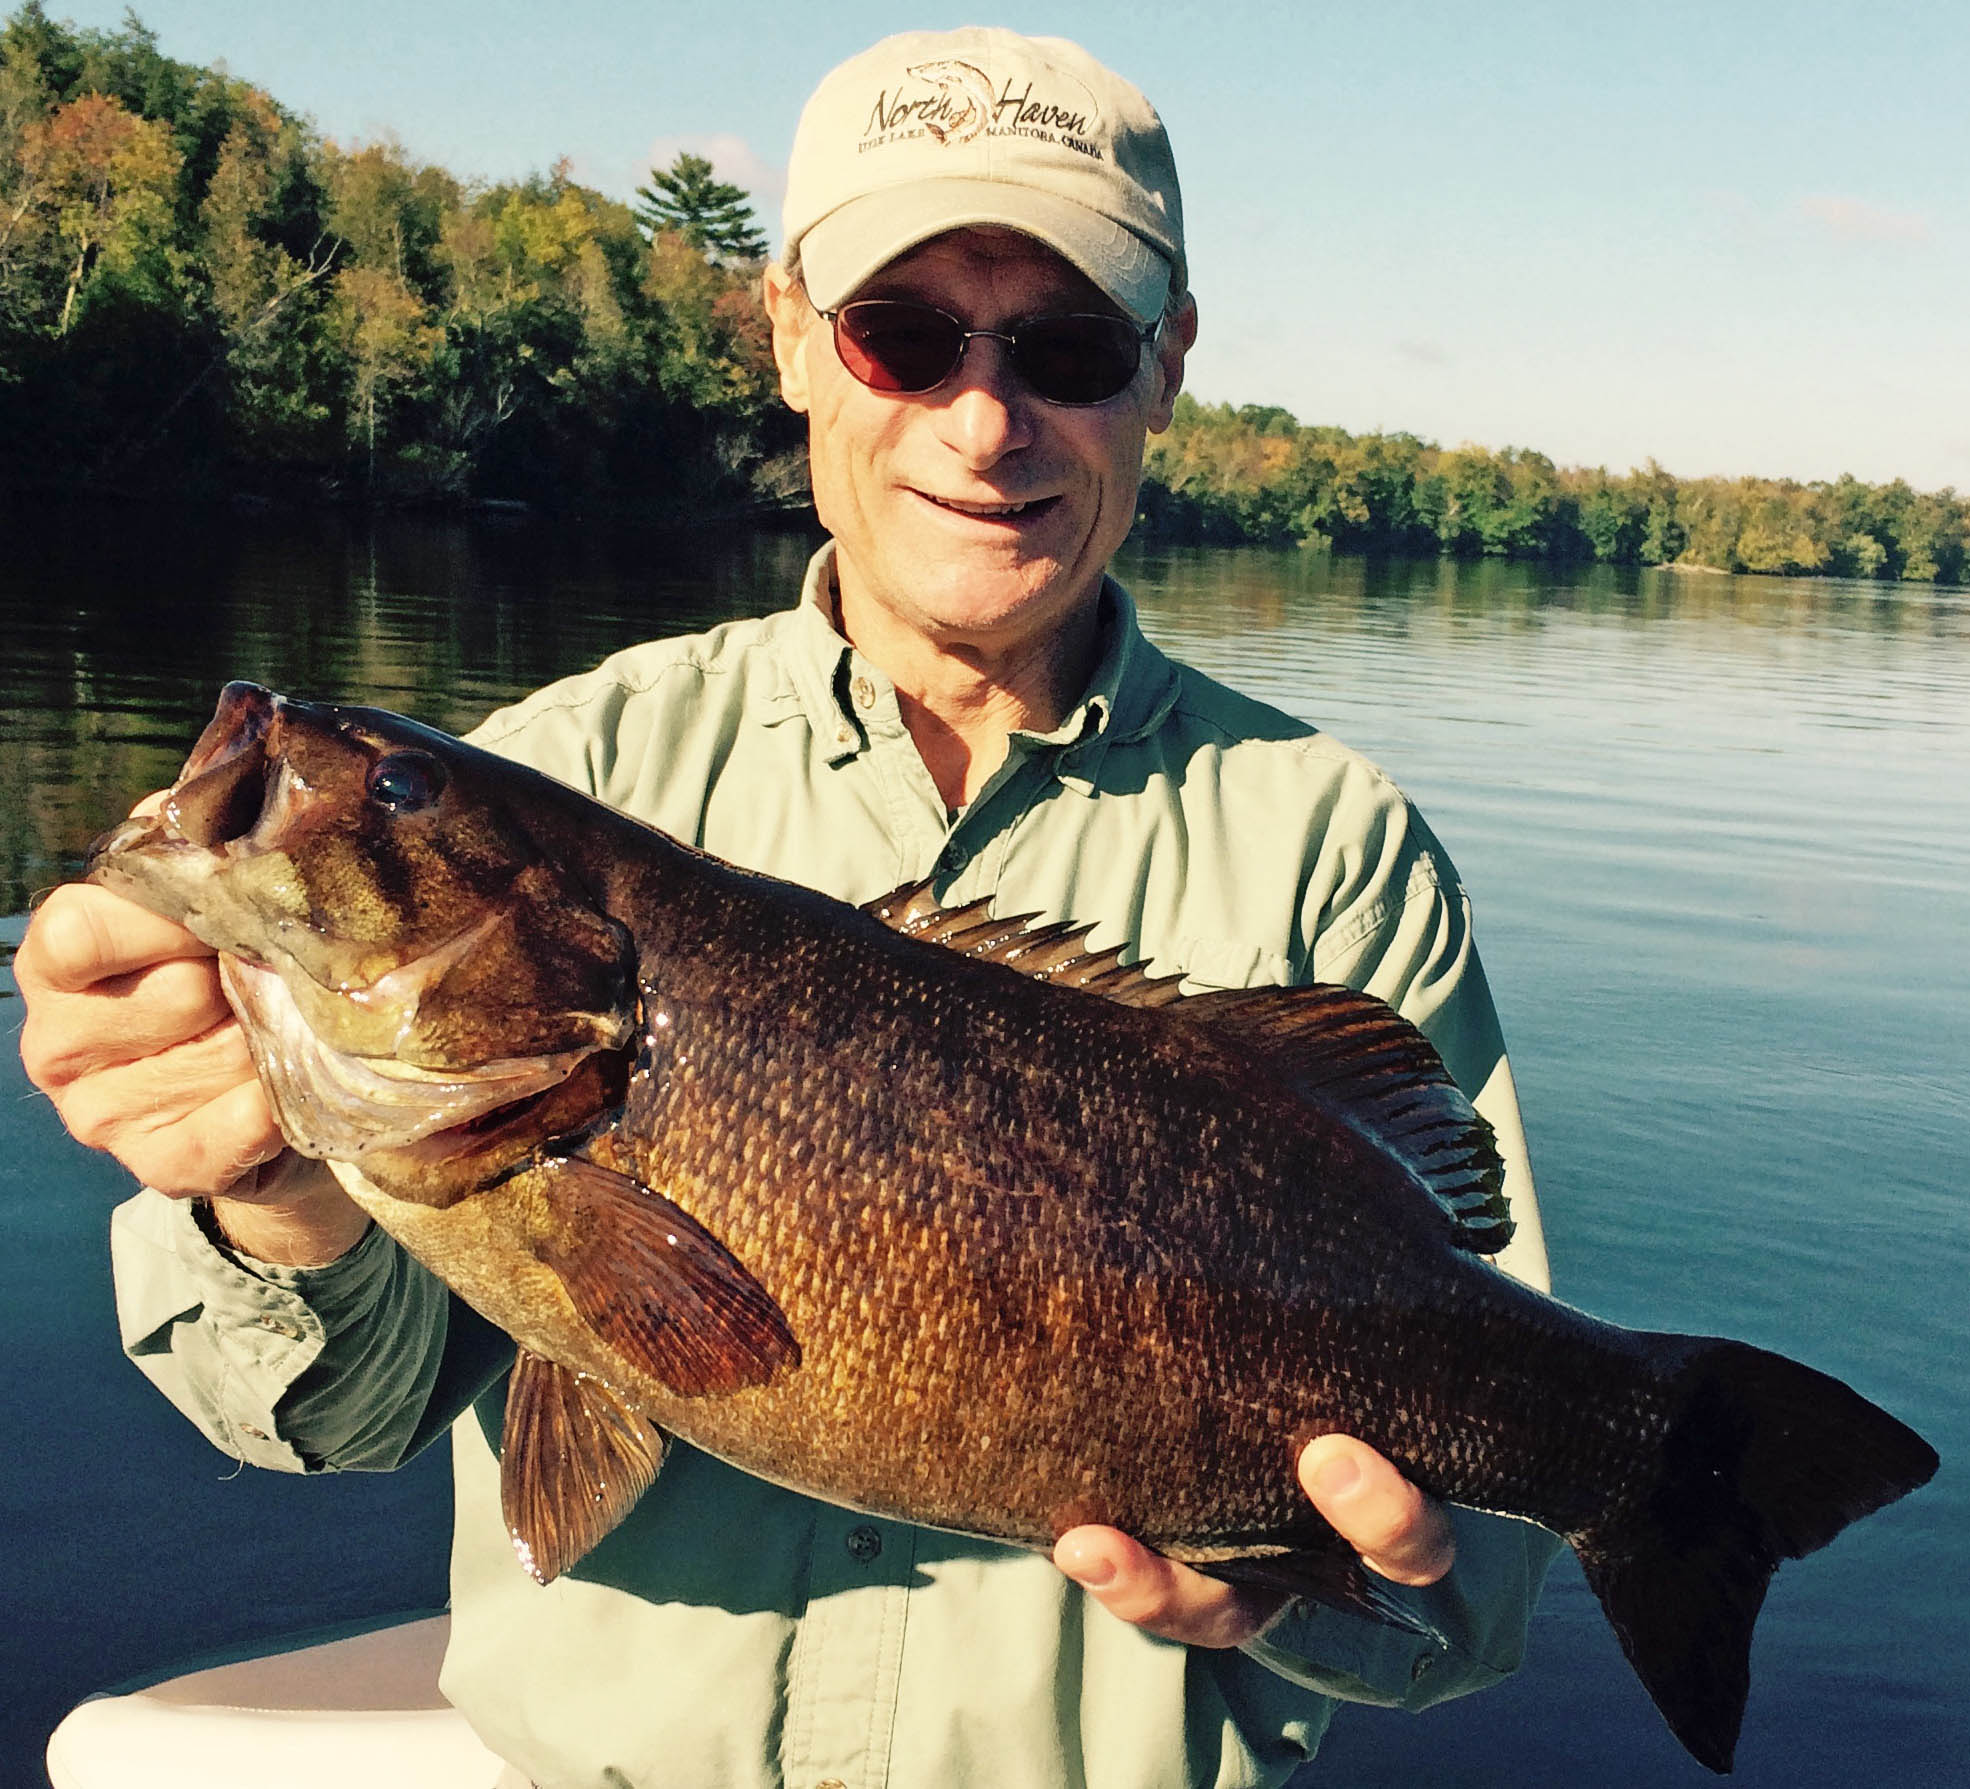 Giant smallmouth bass